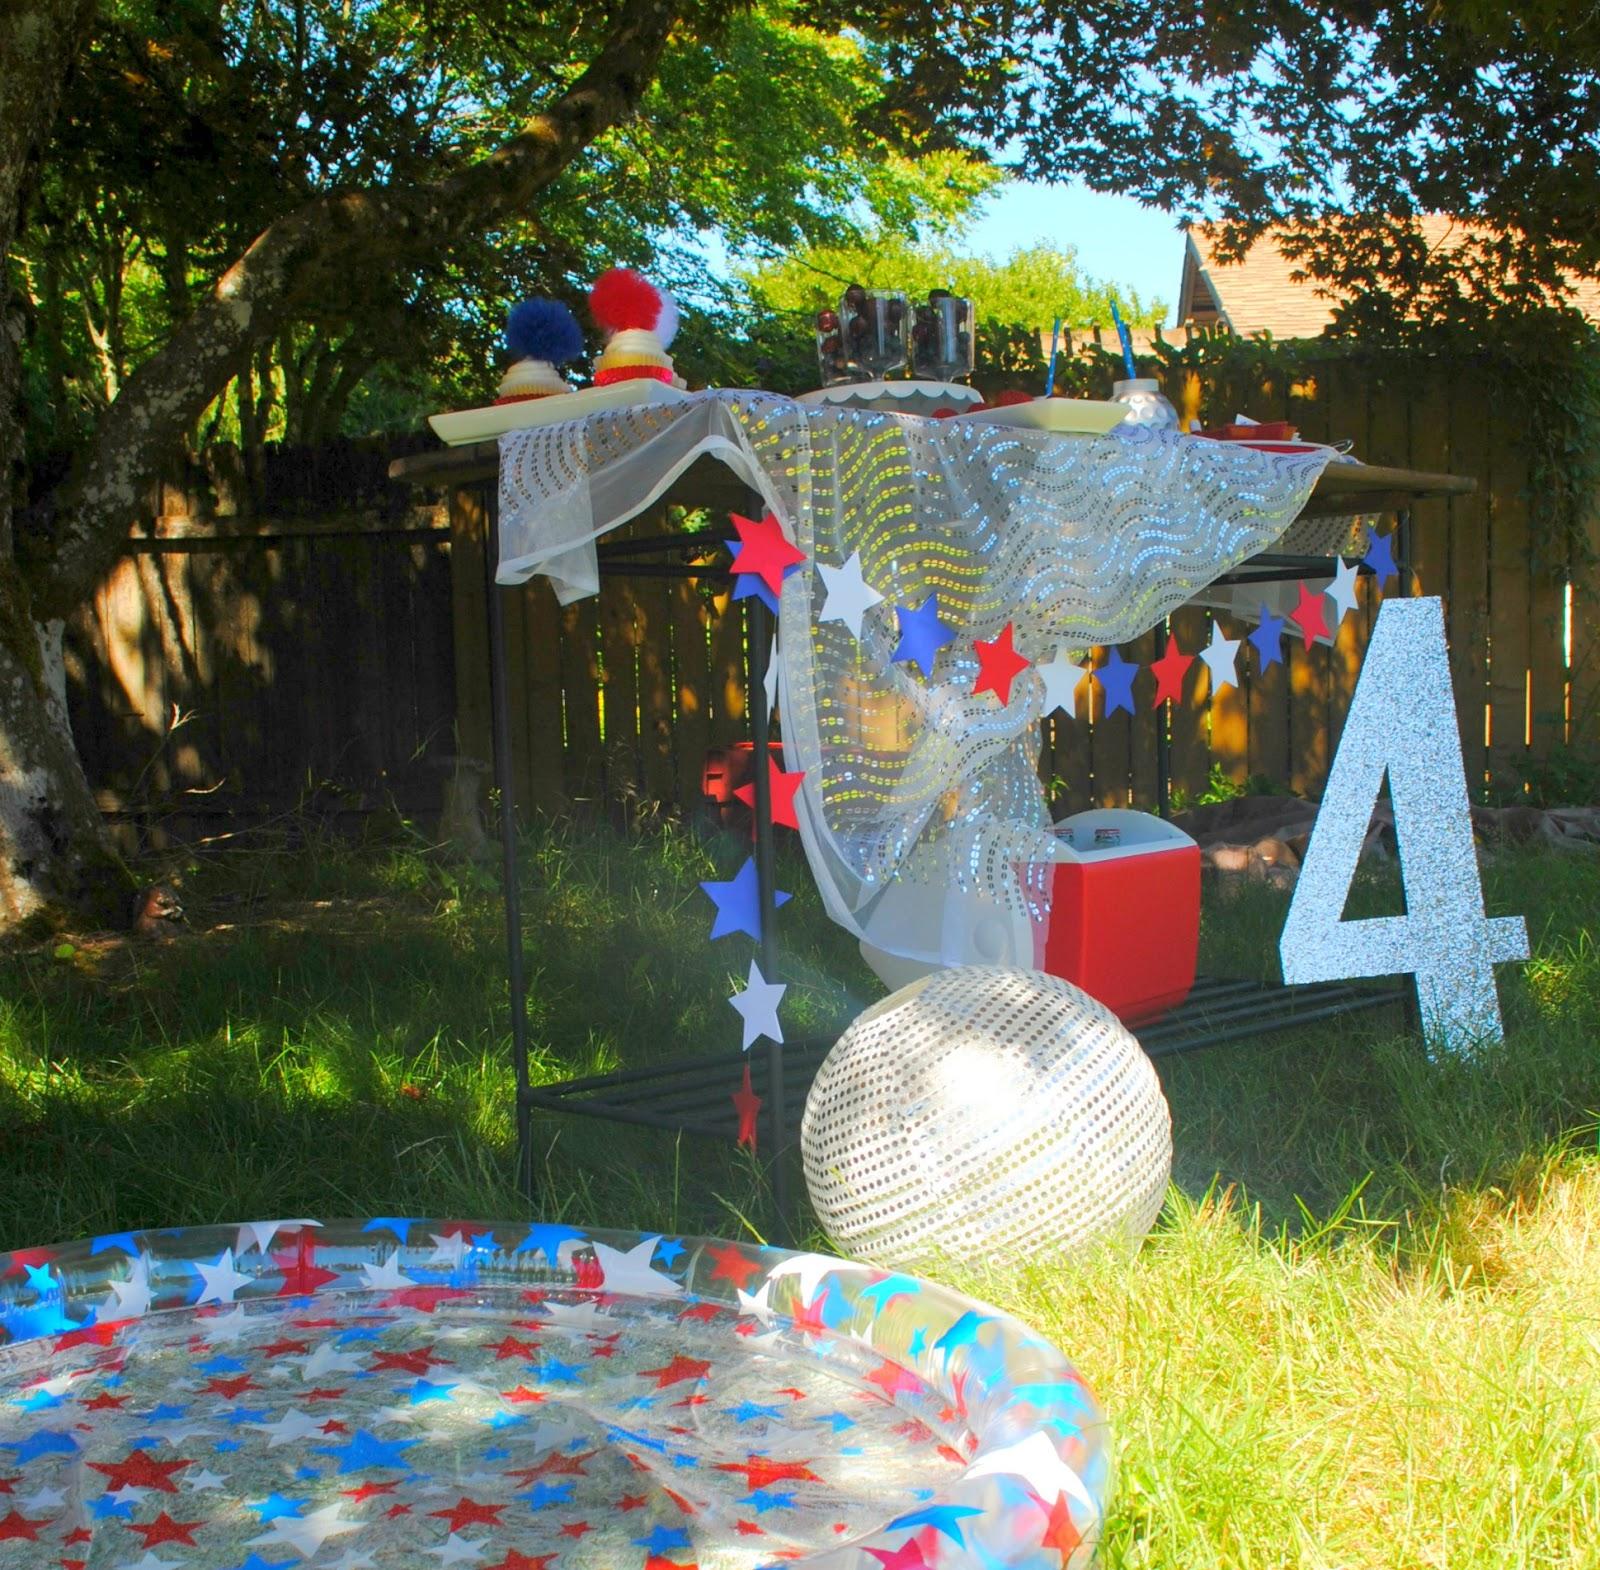 Fizzy Party June 2017